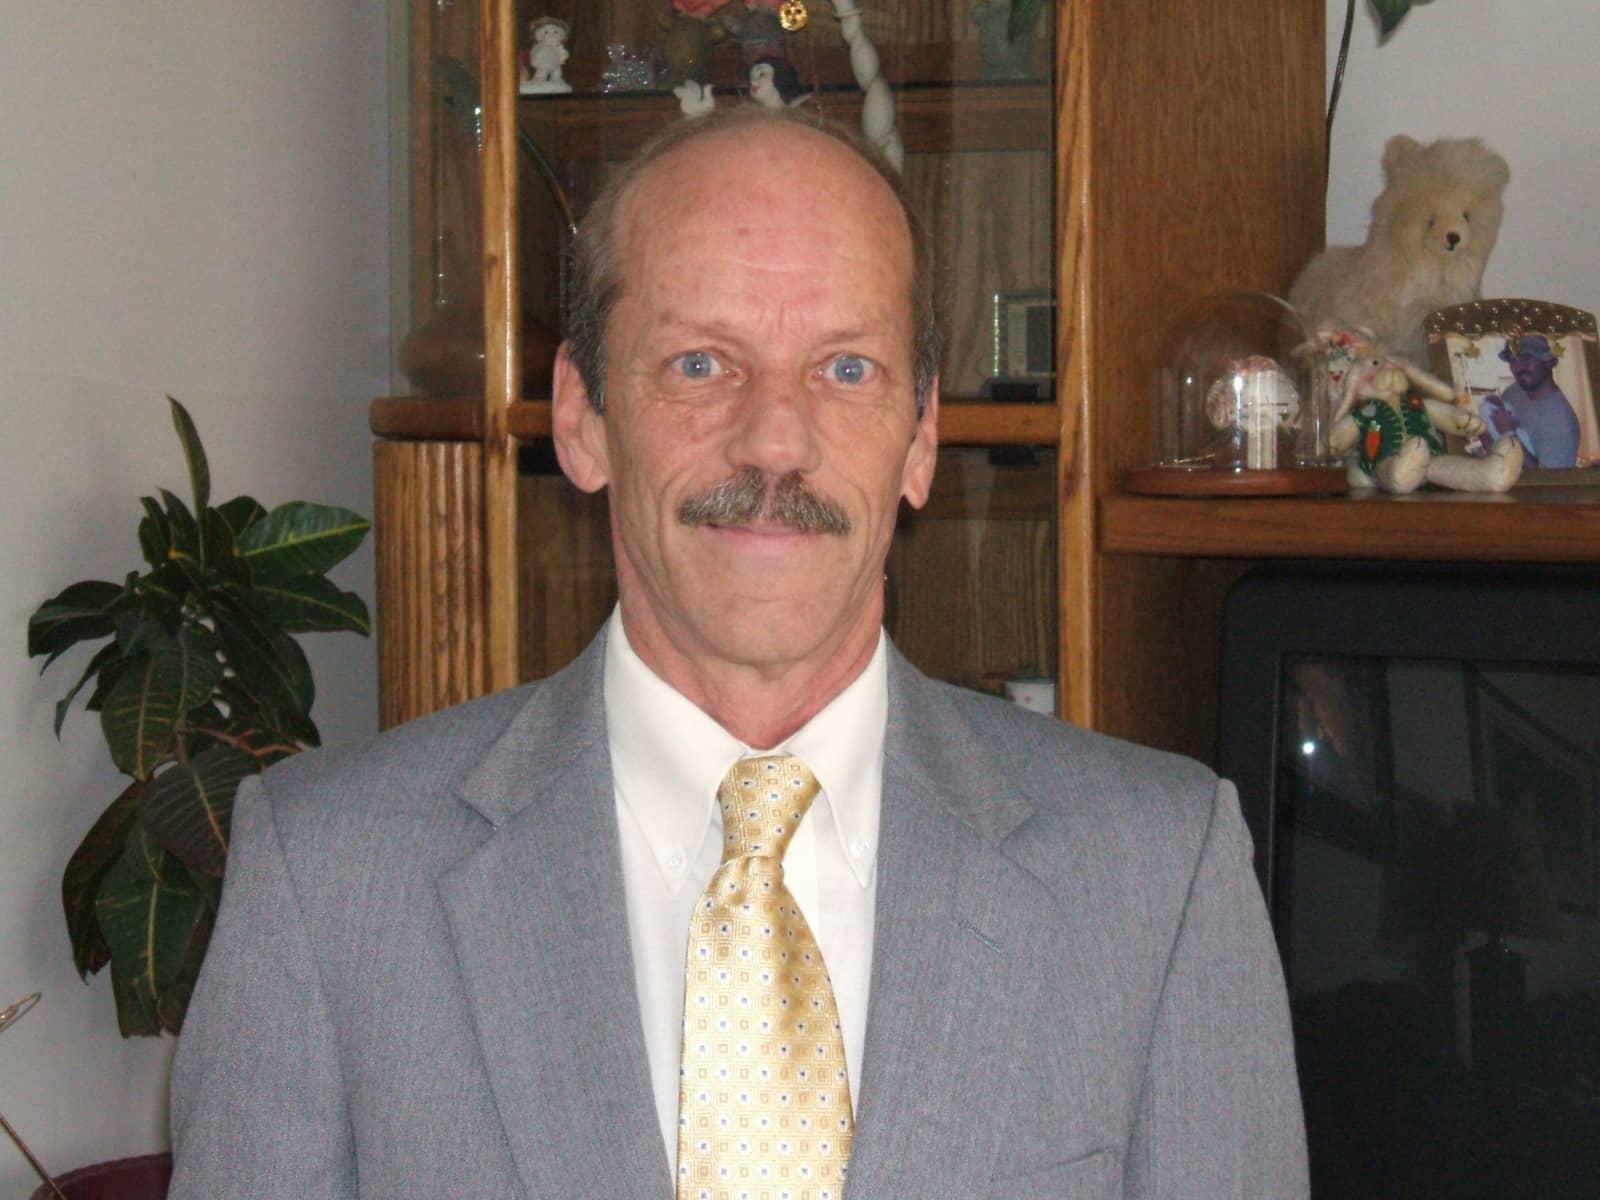 John from Wichita, Kansas, United States